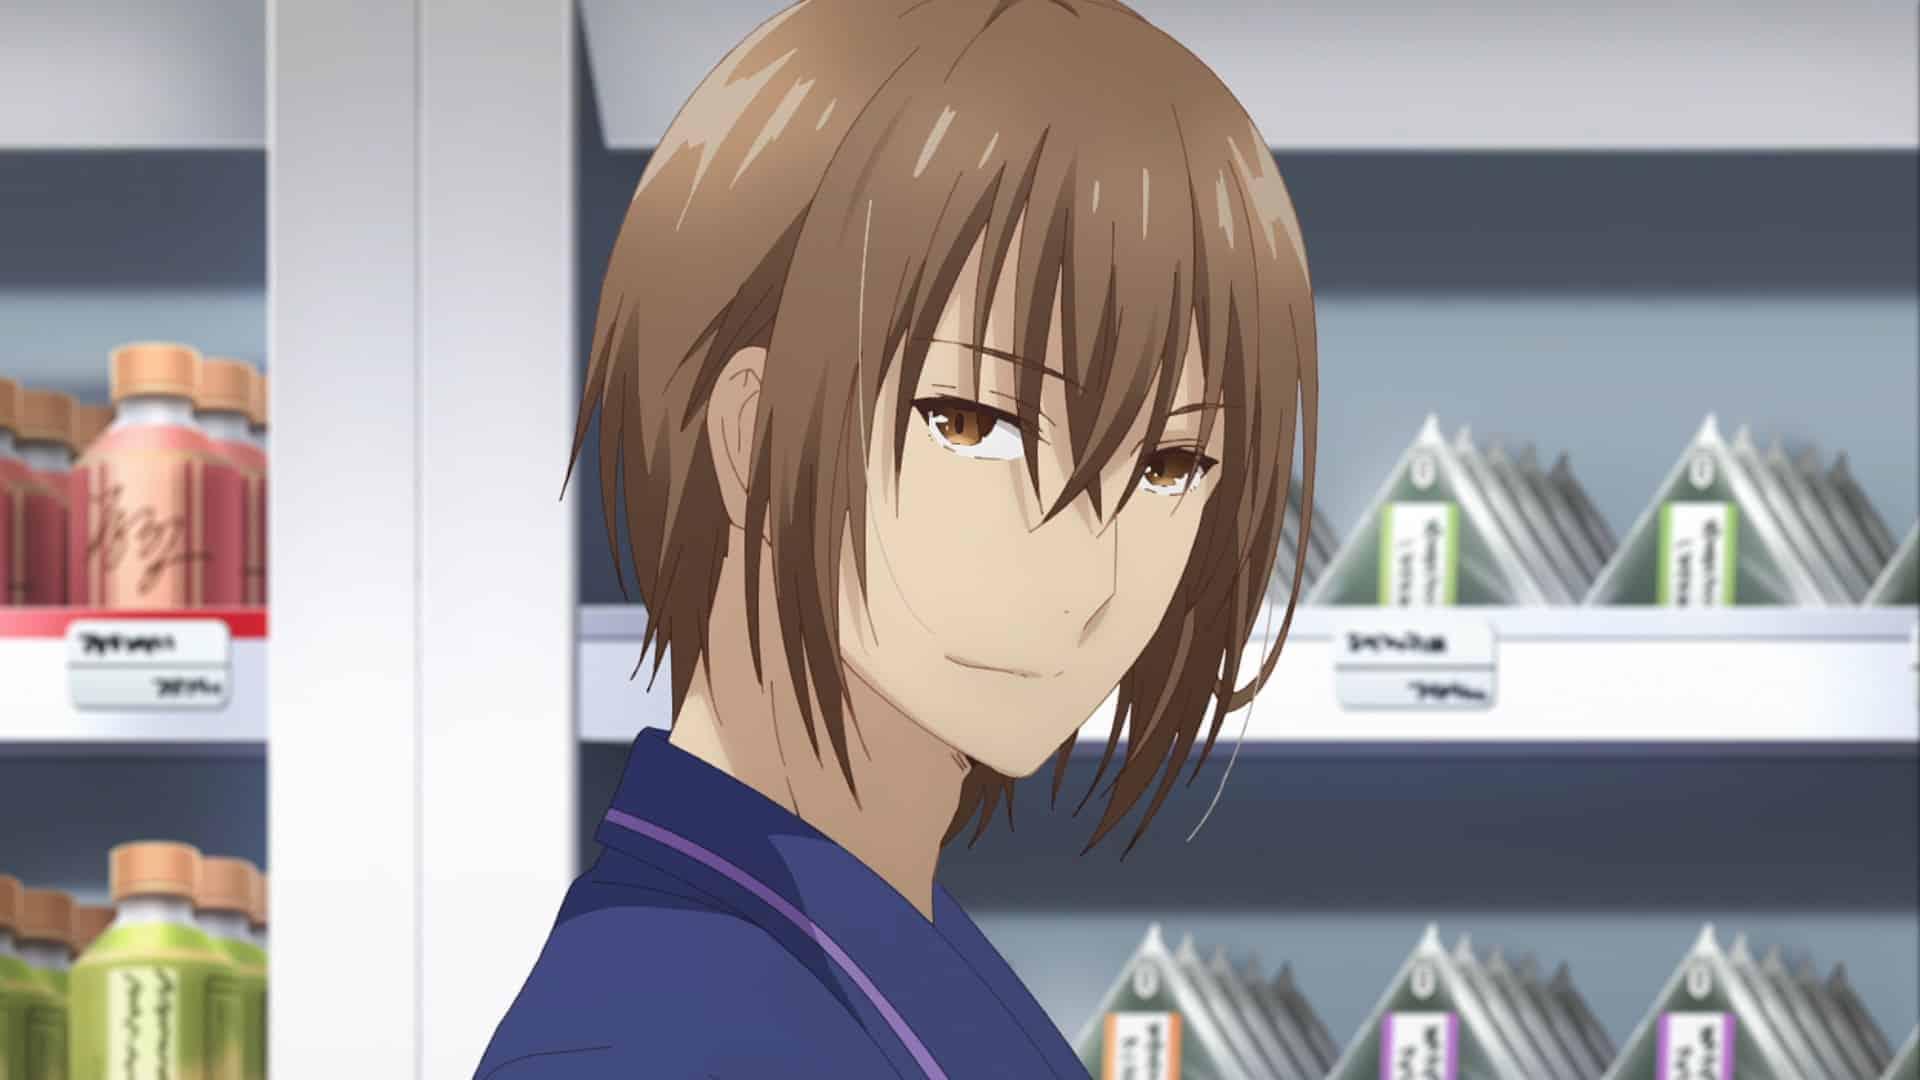 One of the guys Sayu slept with